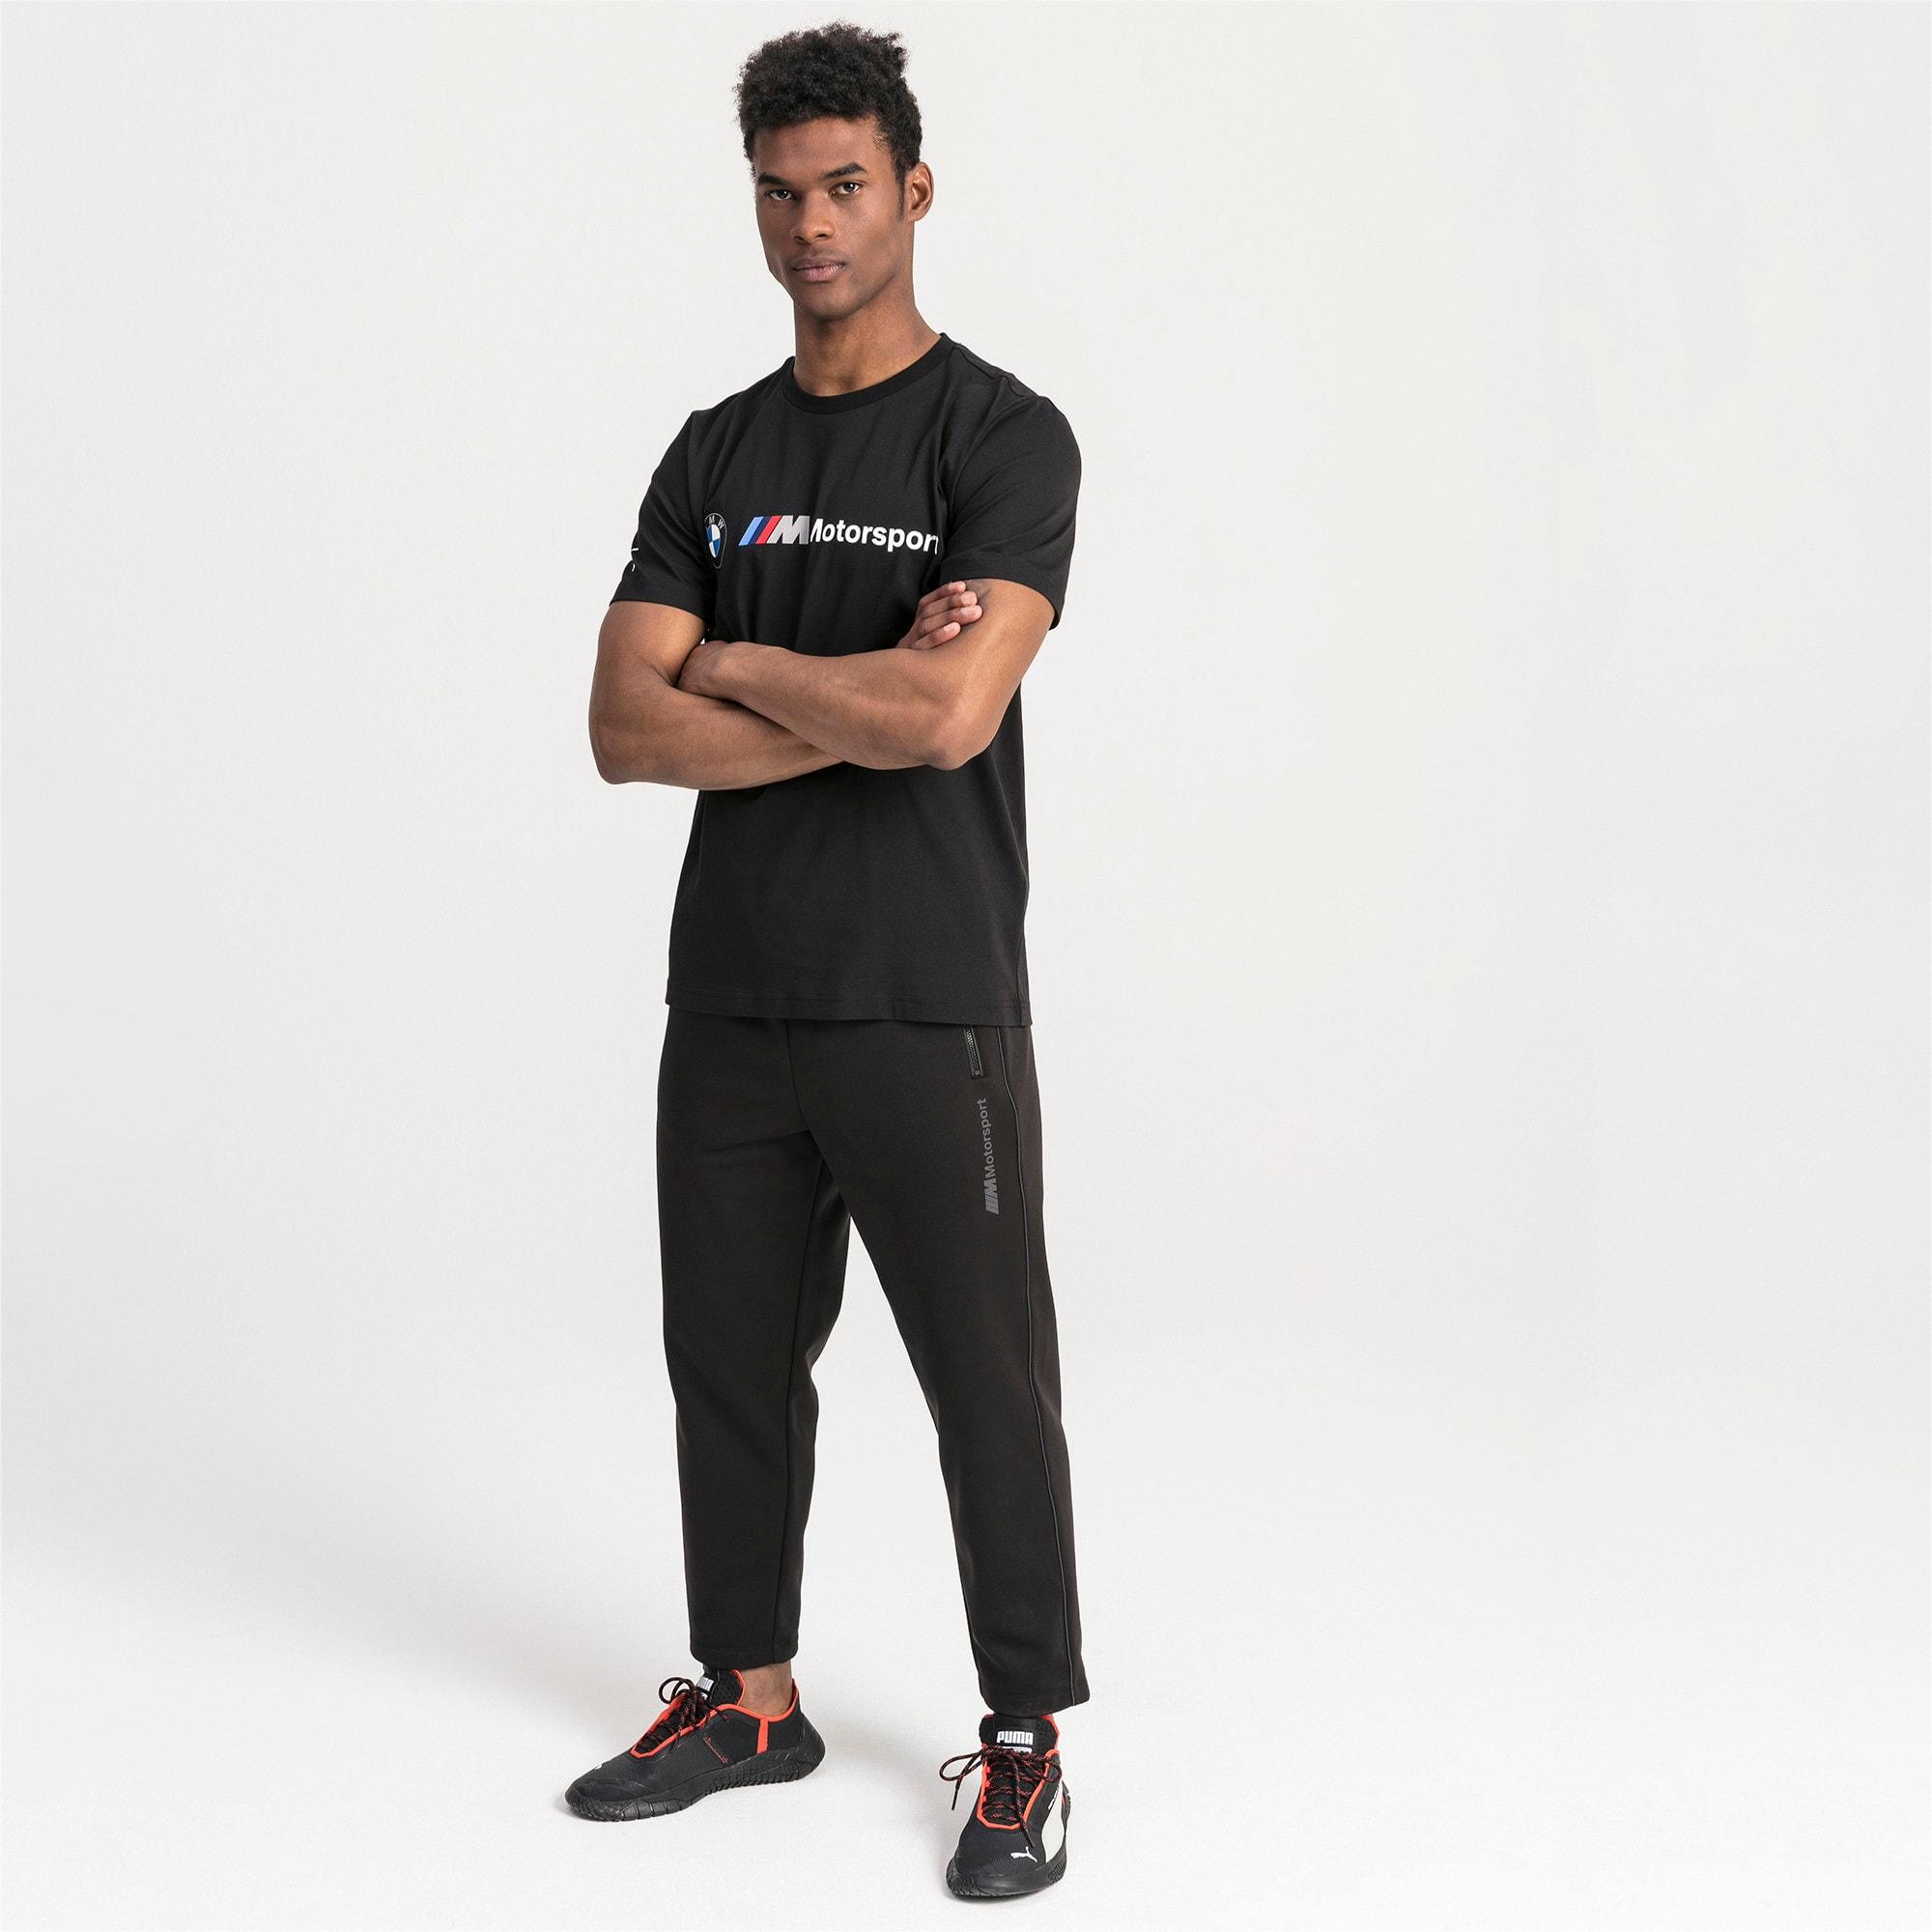 Thumbnail 3 of T-shirt con logo BMW M Motorsport uomo, Puma Black, medium